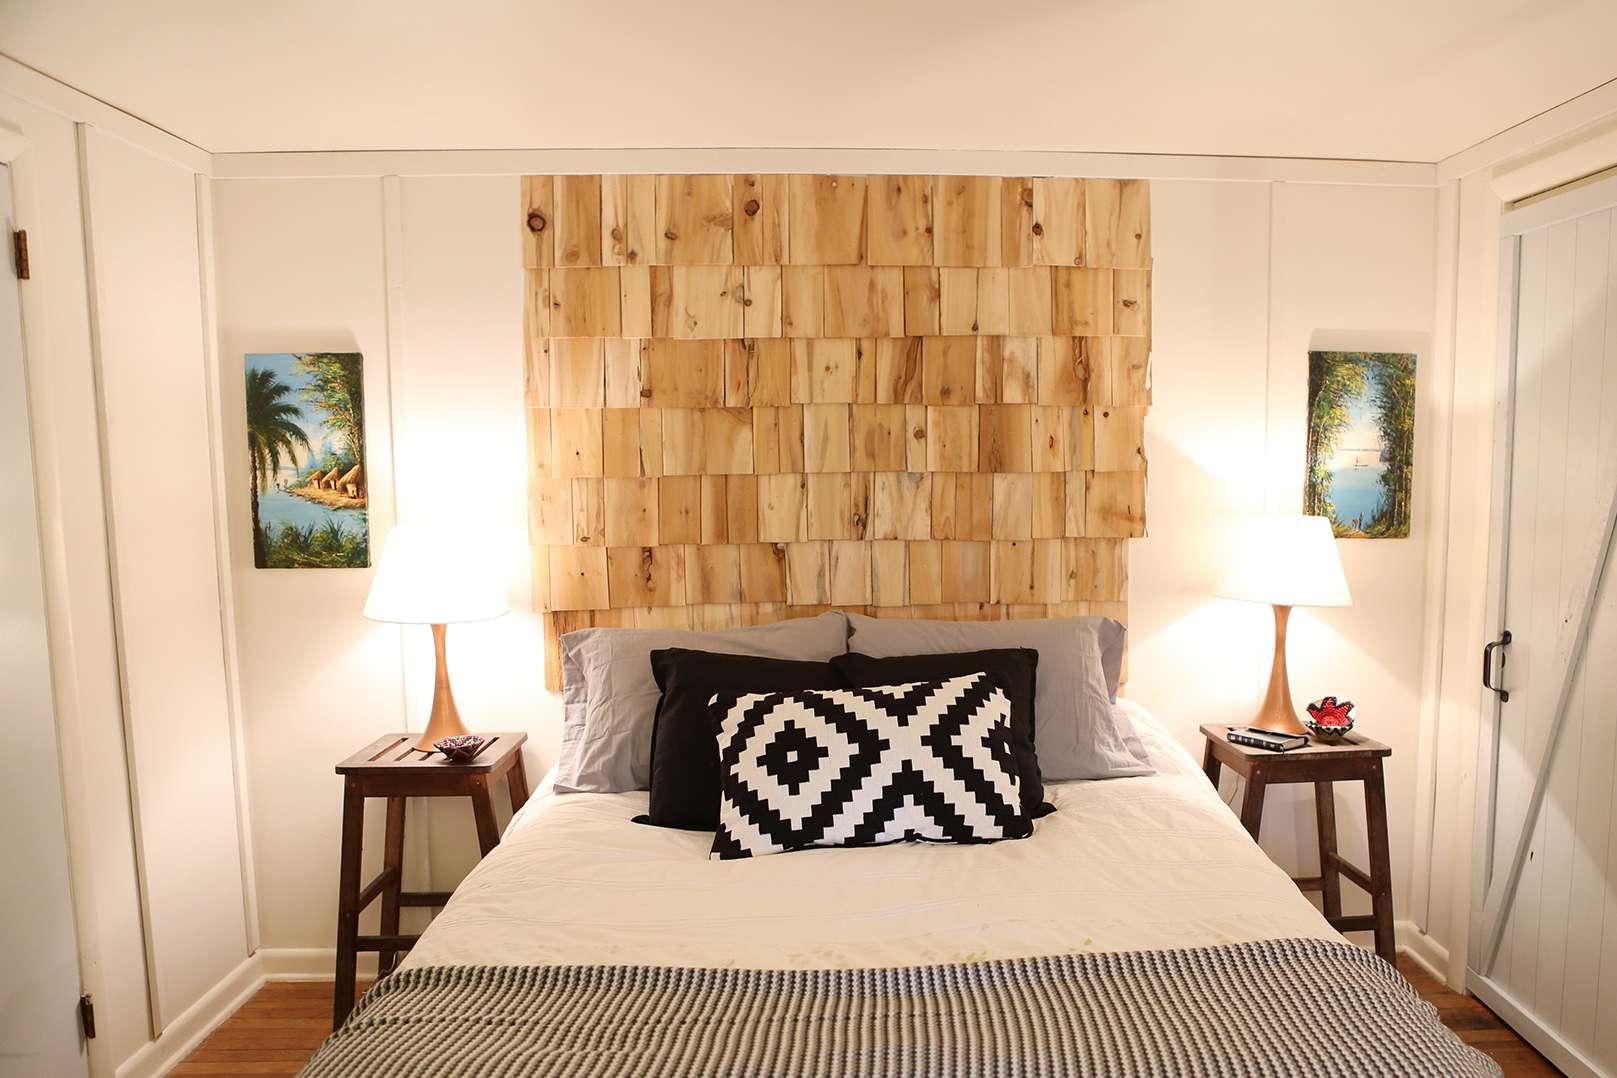 Cedar Shingle DIY headboard